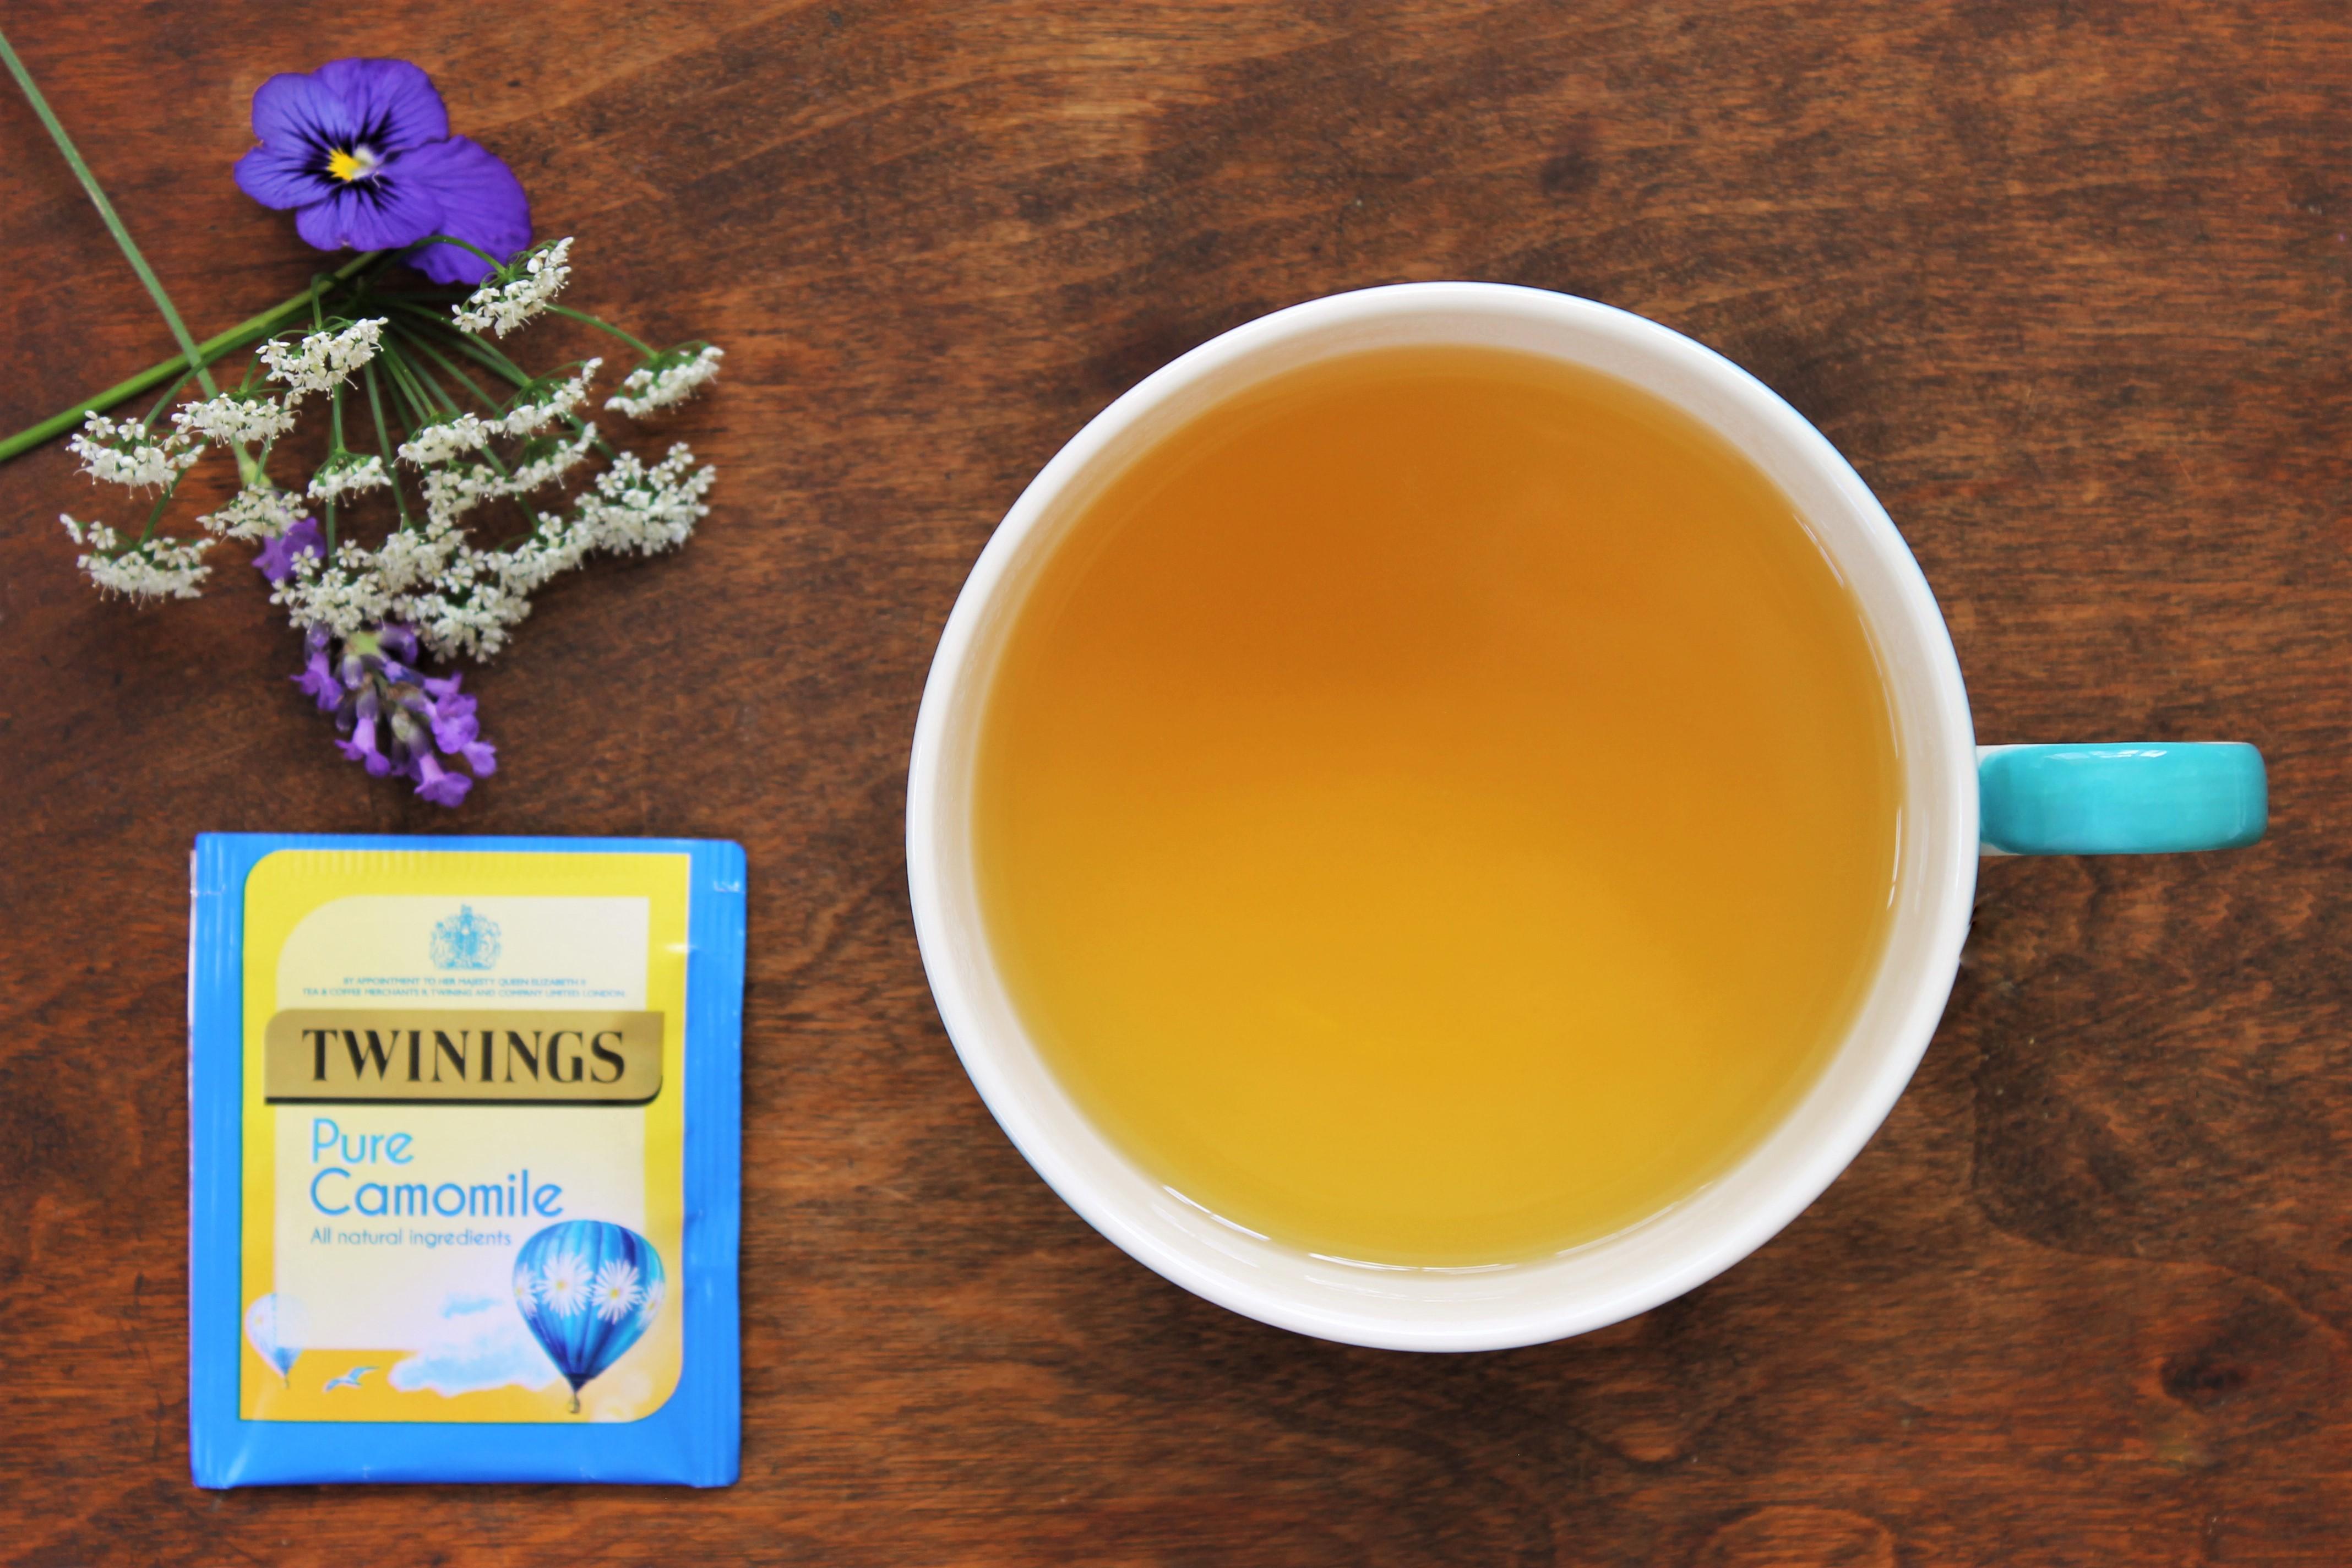 Twinings Pure Camomile Tea Review